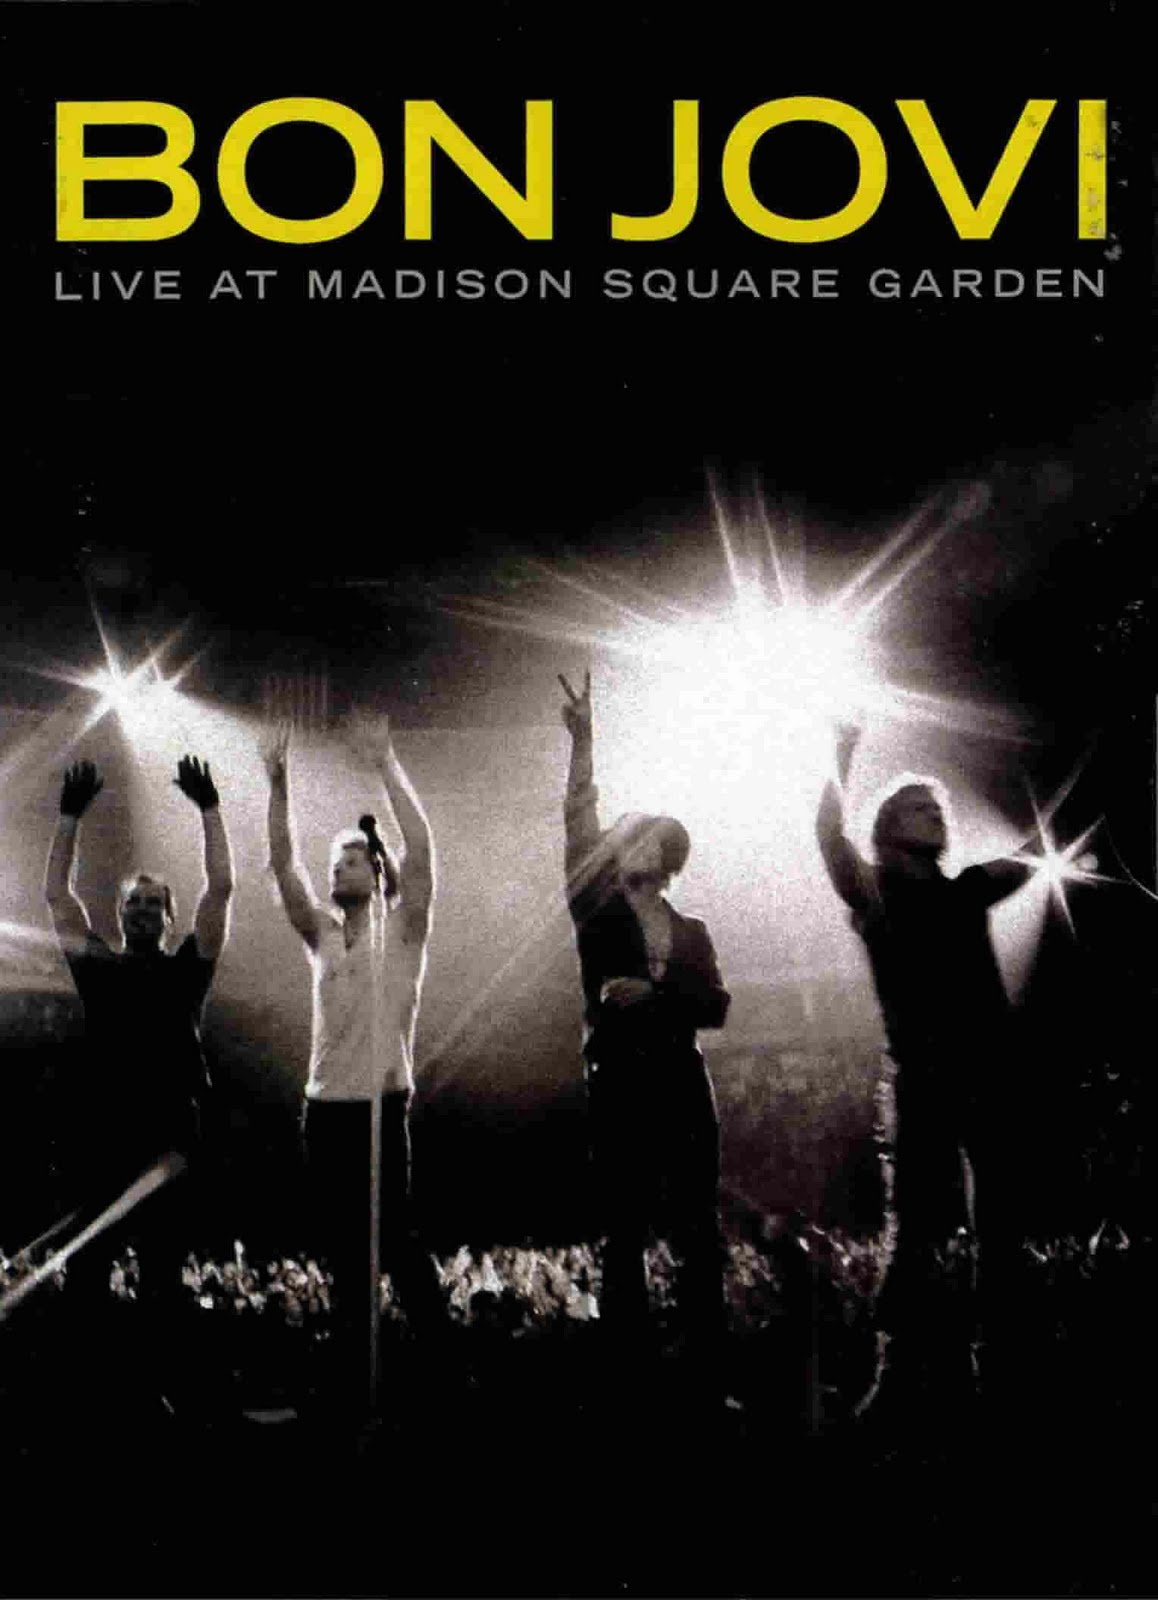 Downmovies shows for Bon jovi madison square garden april 13